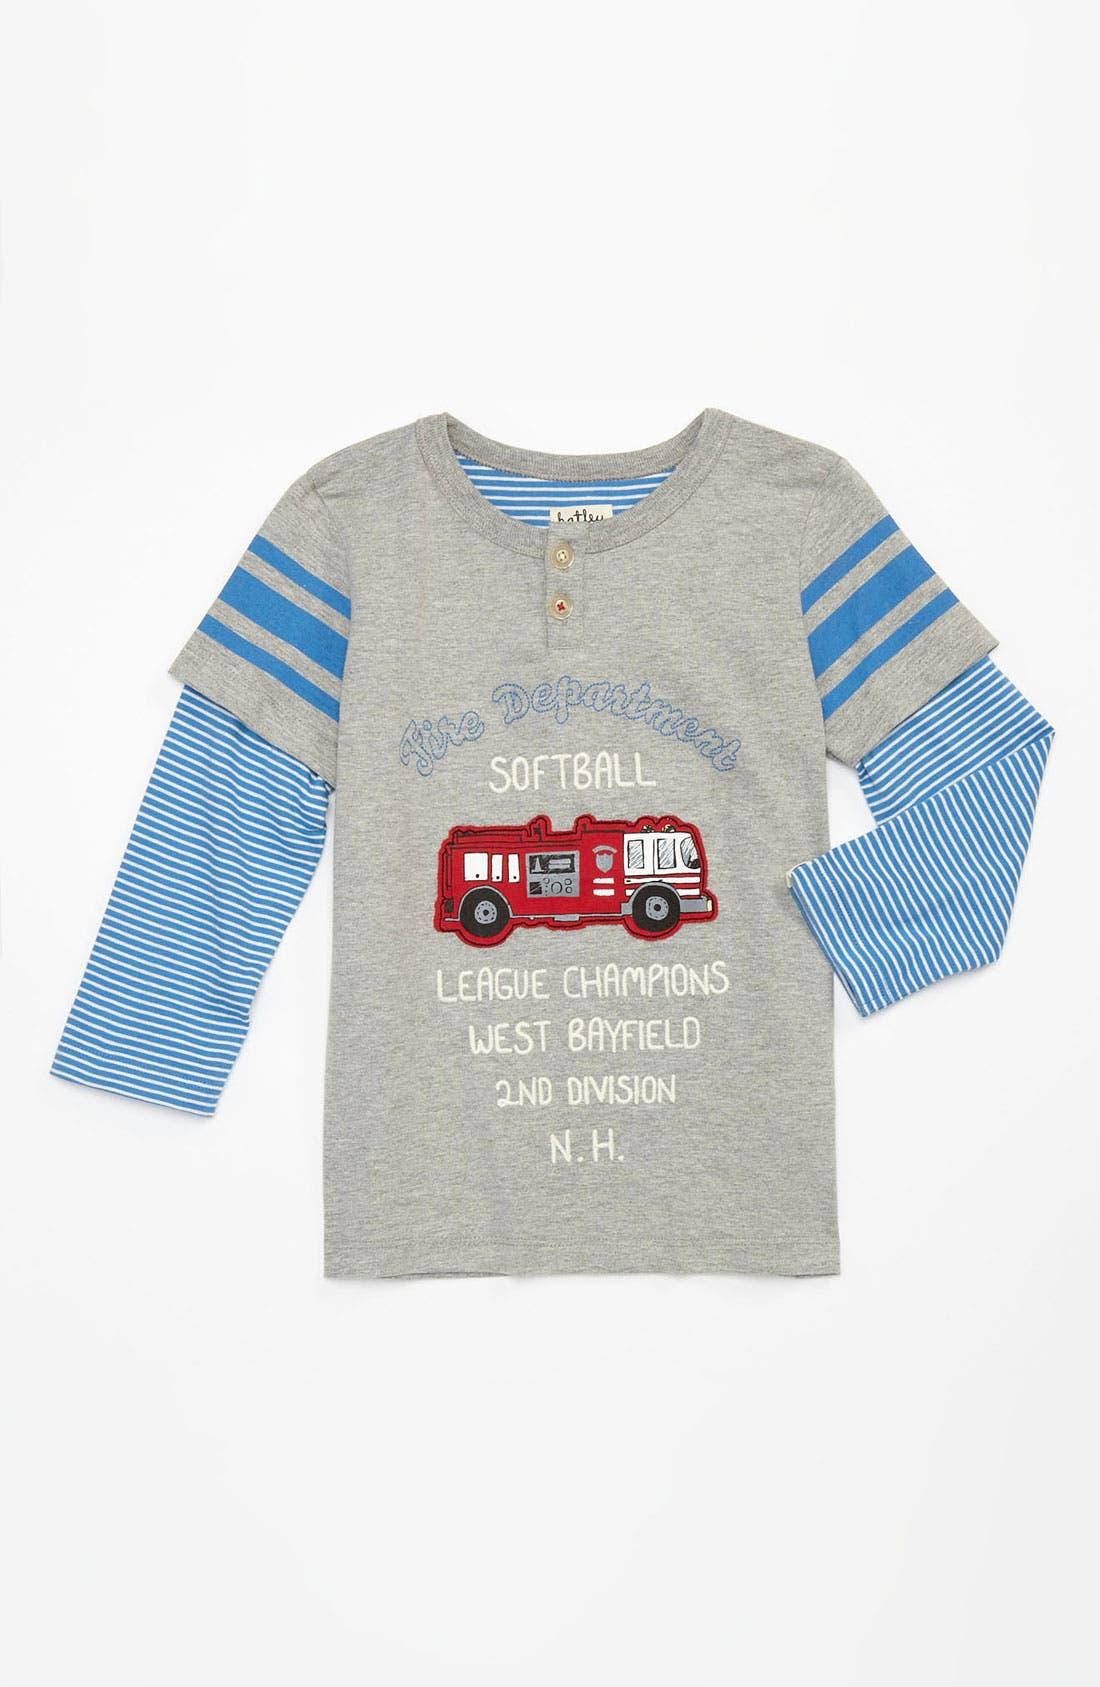 Alternate Image 1 Selected - Hatley 'Fire Department Softball' T-Shirt (Toddler)